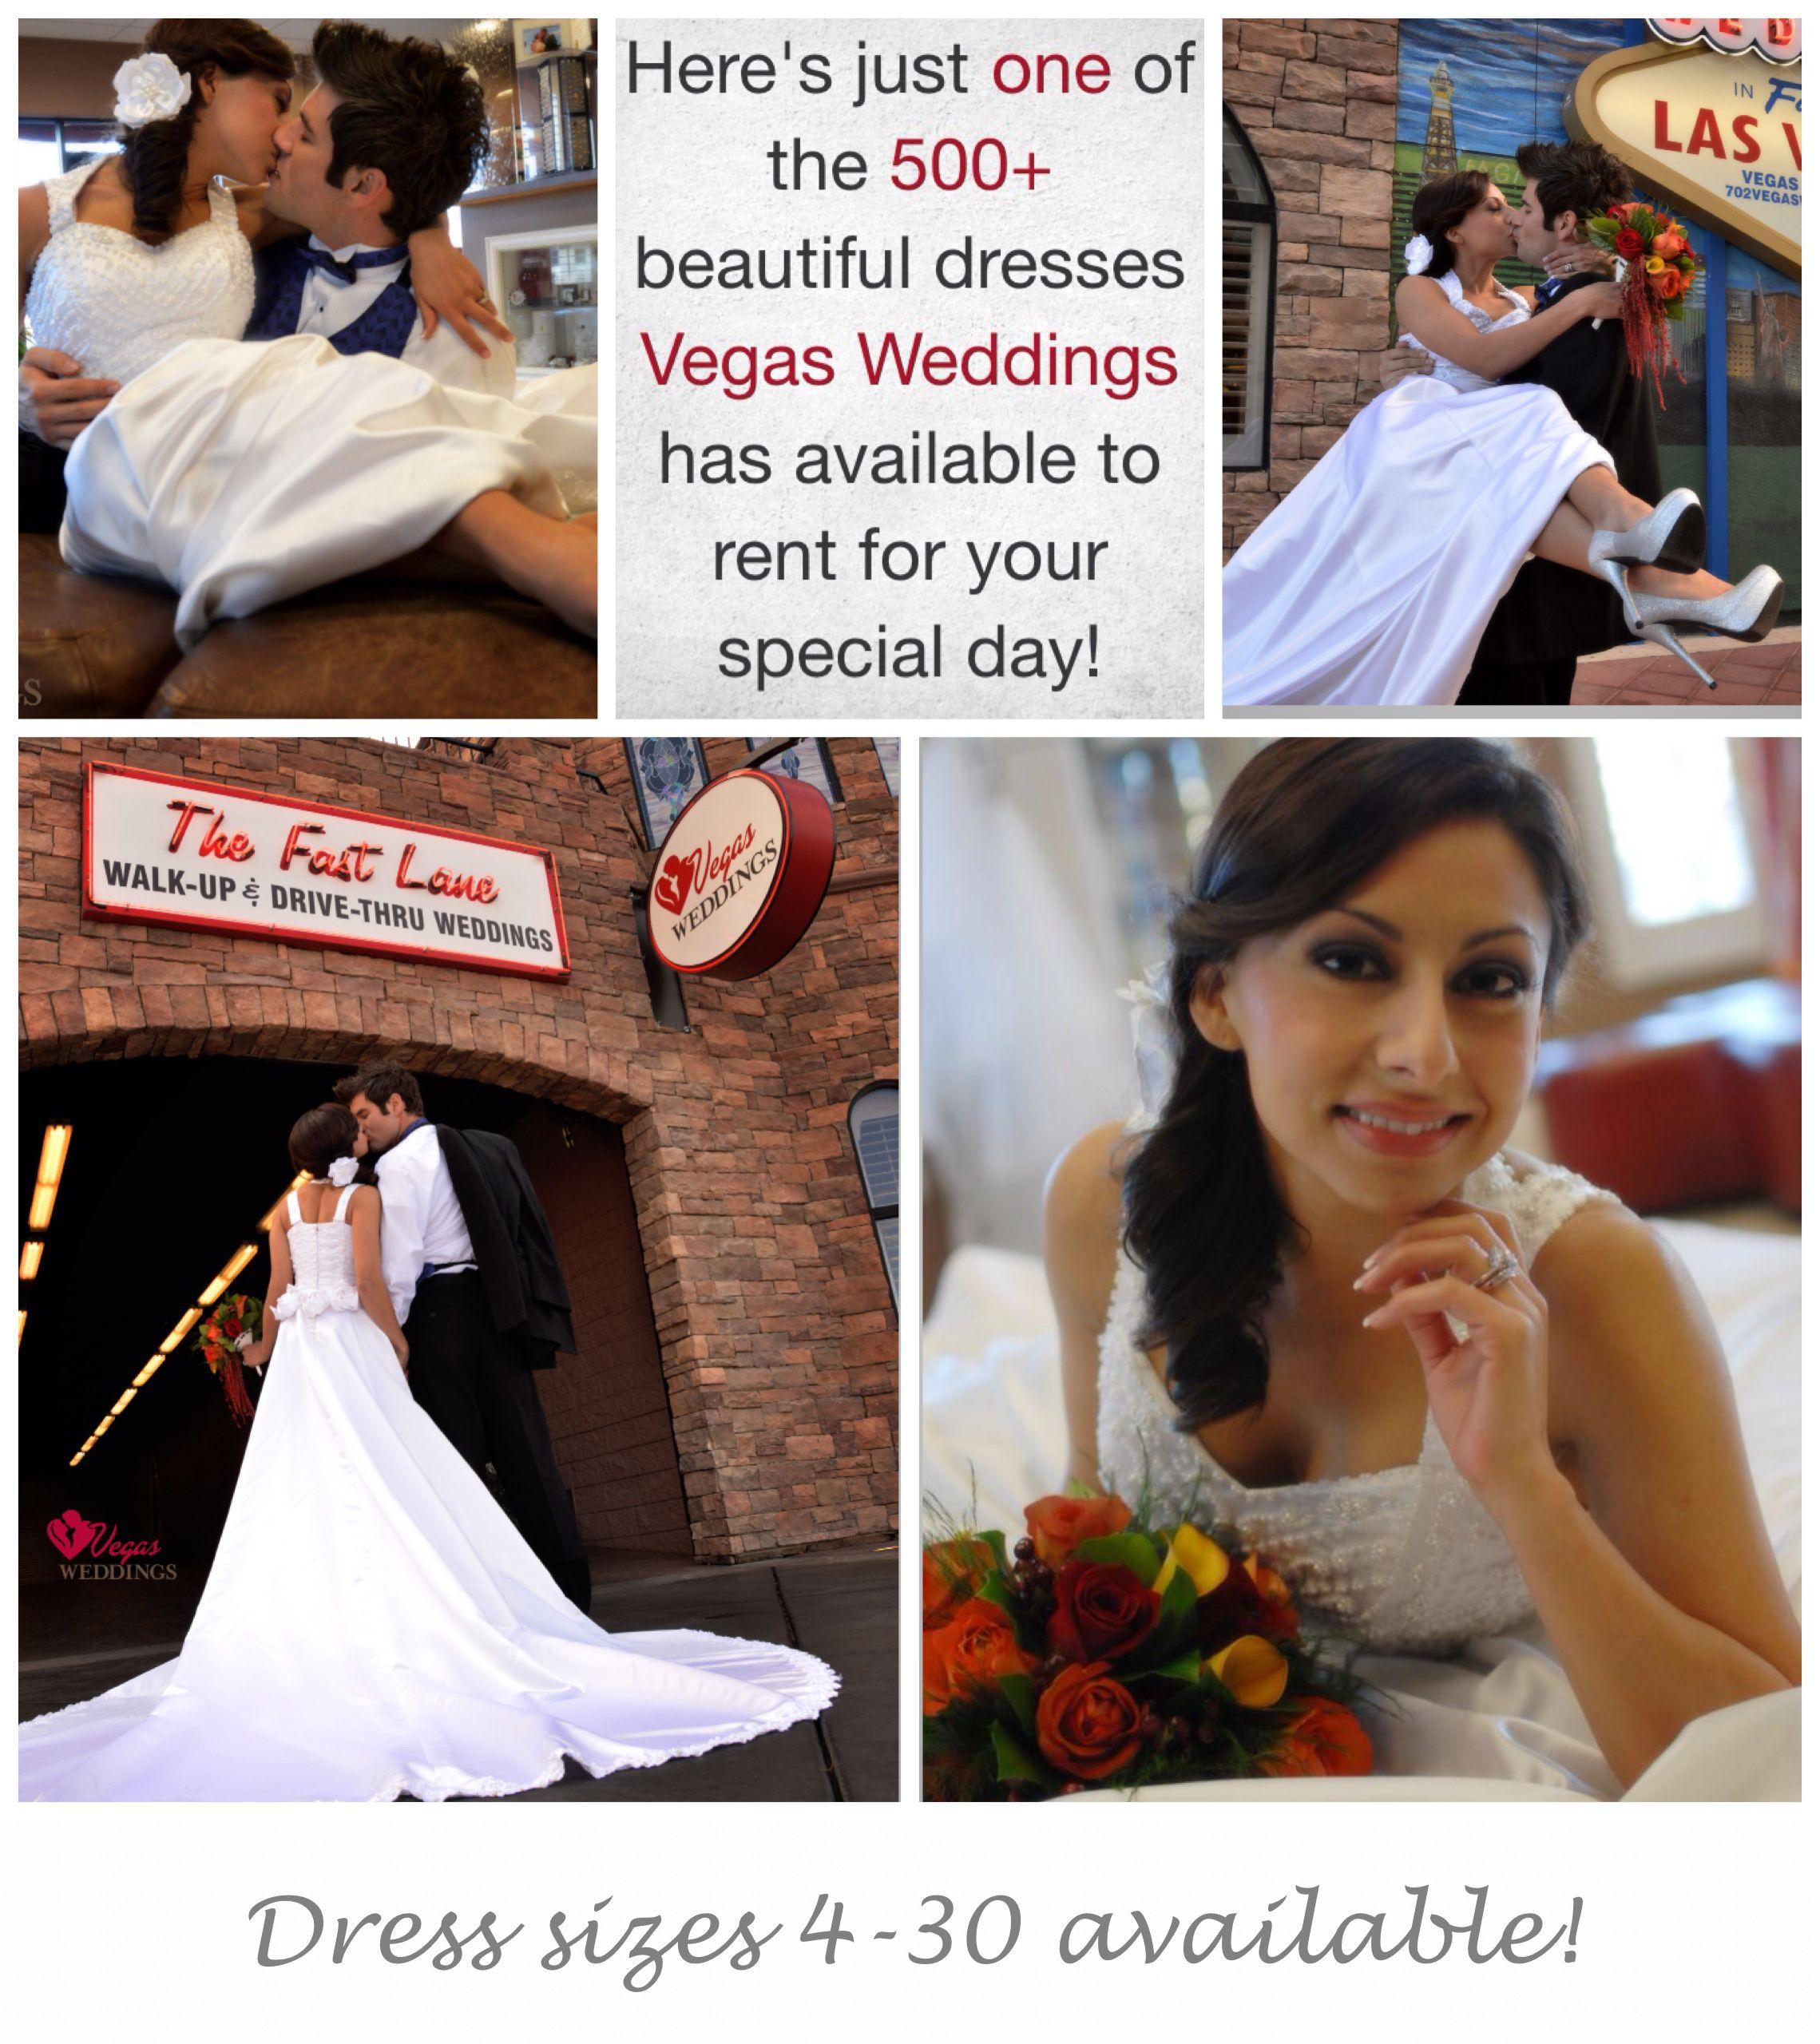 Wedding Dress Rental In Las Vegas Even If You Re Not Getting